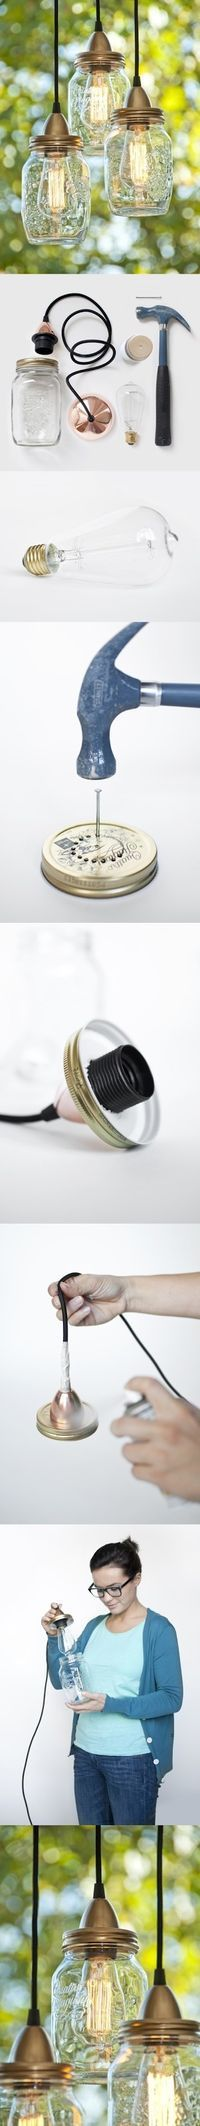 I live mason jar lights! DIY :: How to Make Mason Jar Lights Pot Mason Diy, Diy Mason Jar Lights, Mason Jar Lighting, Mason Jar Crafts, Mason Jars, Kitchen Lighting, Glass Jars, Cottage Lighting, Kilner Jars